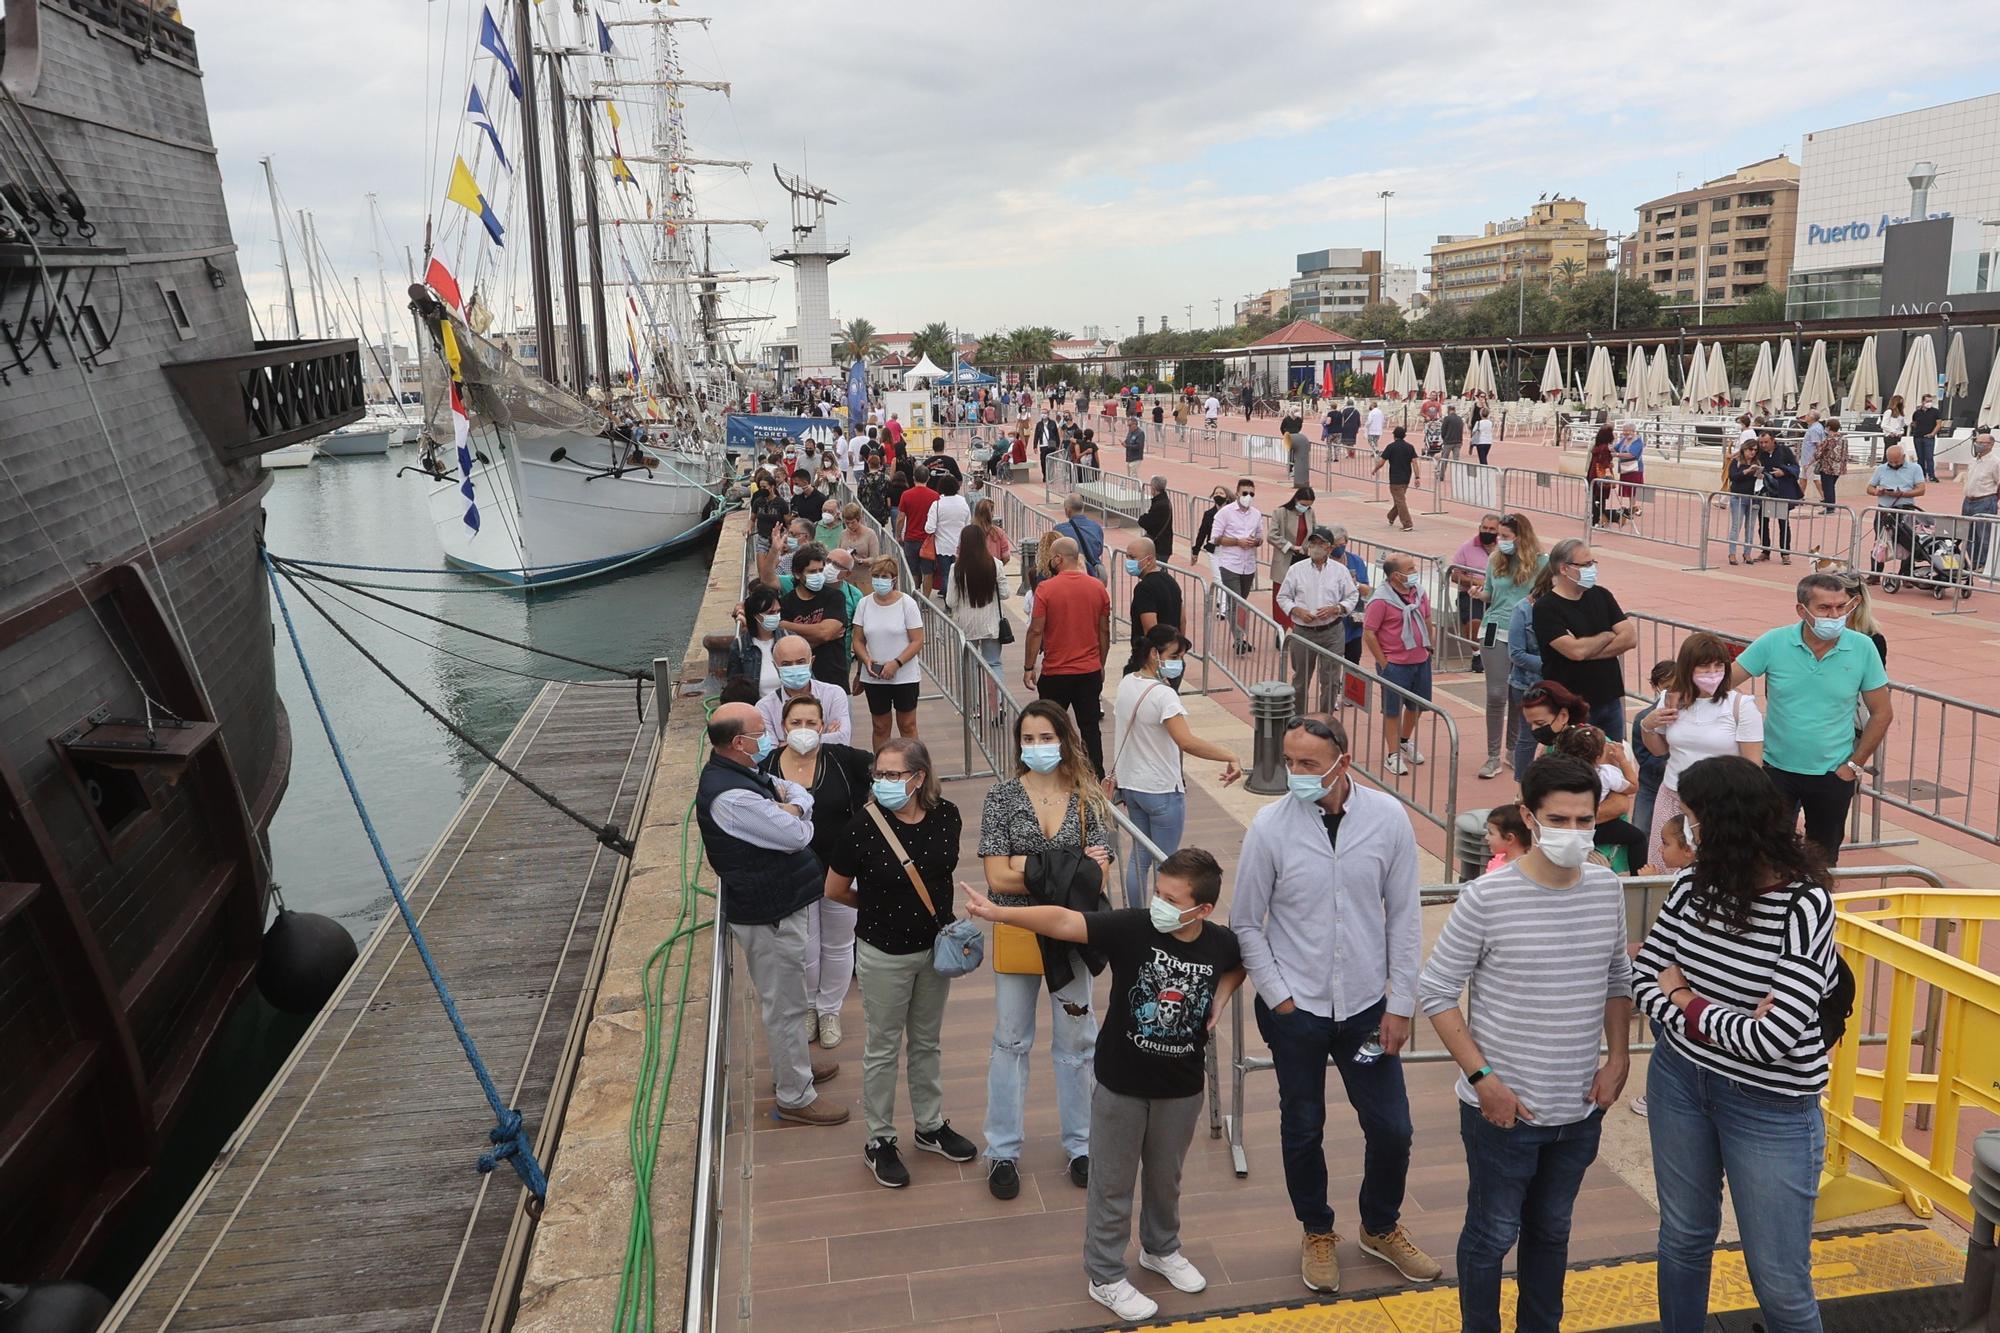 Las mejores imágenes de Escala a Castelló